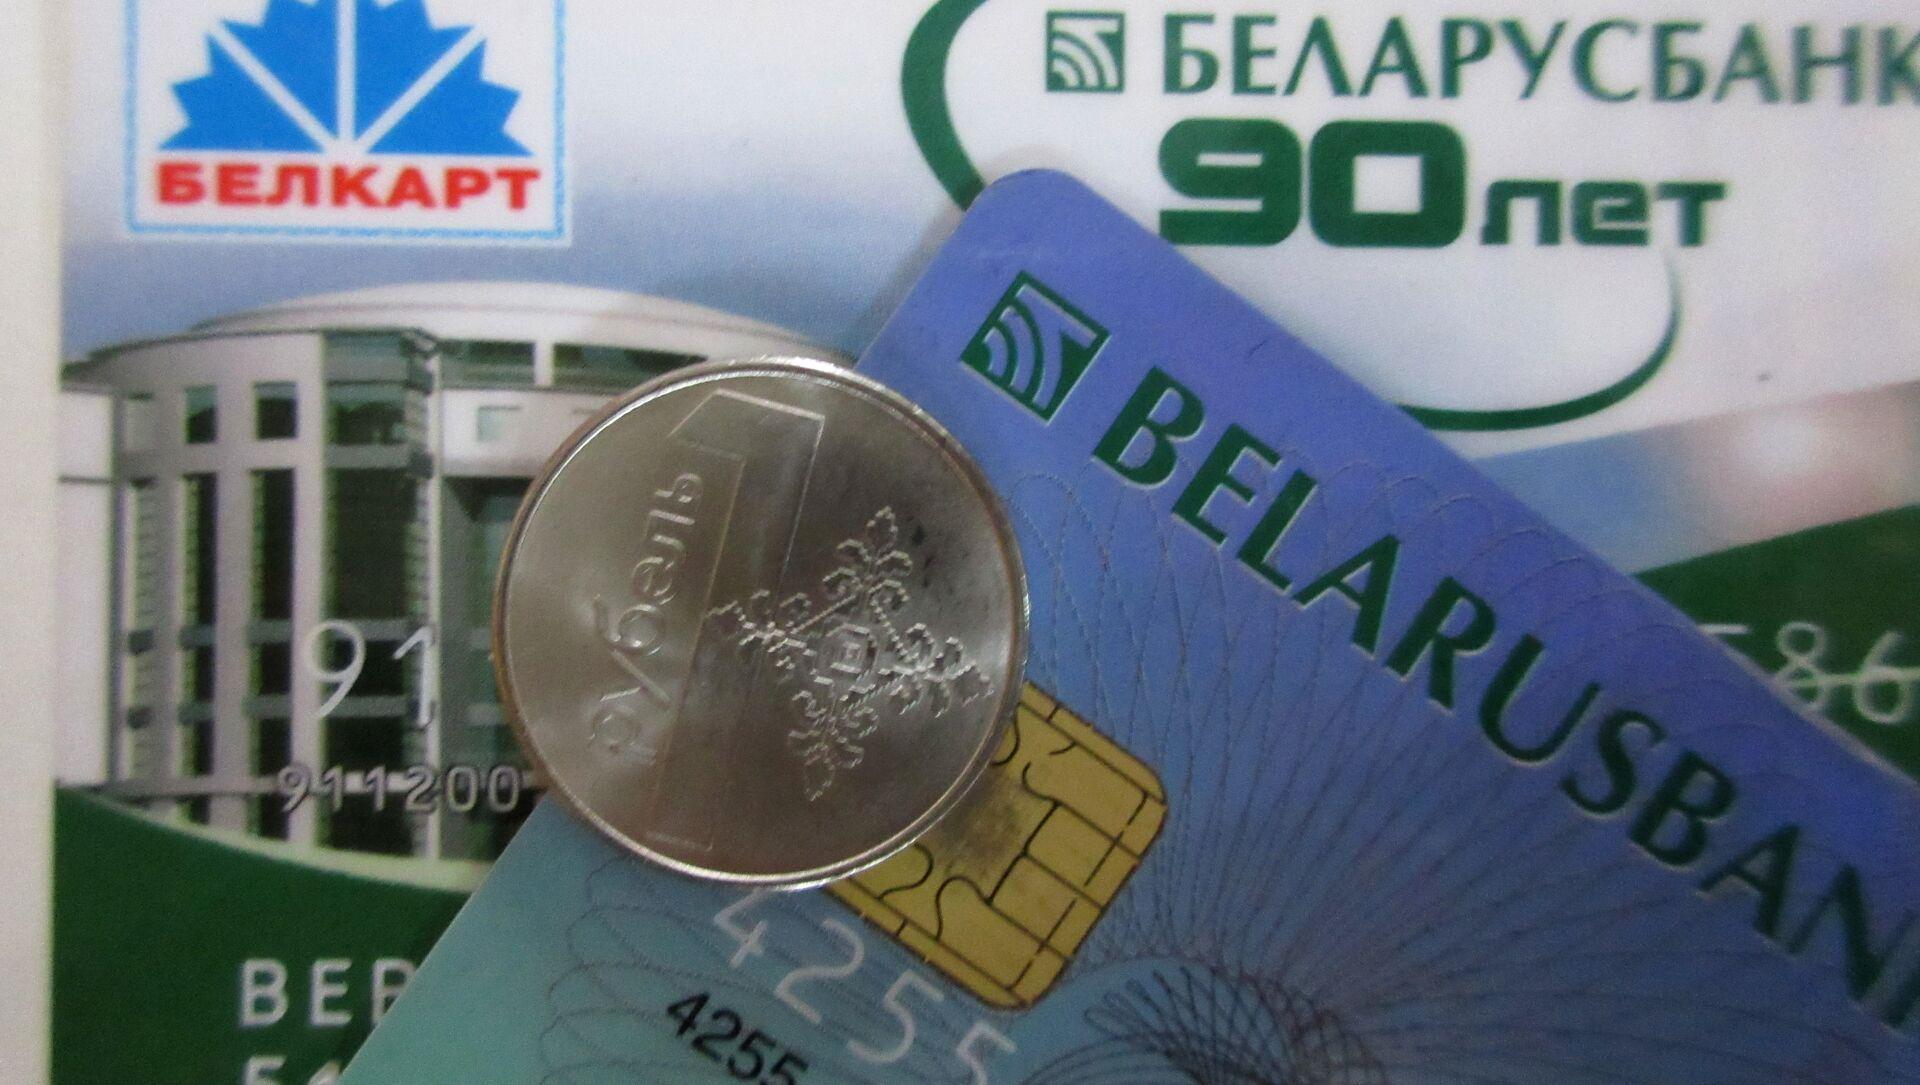 Банковские карты Беларусбанка - Sputnik Беларусь, 1920, 01.03.2021